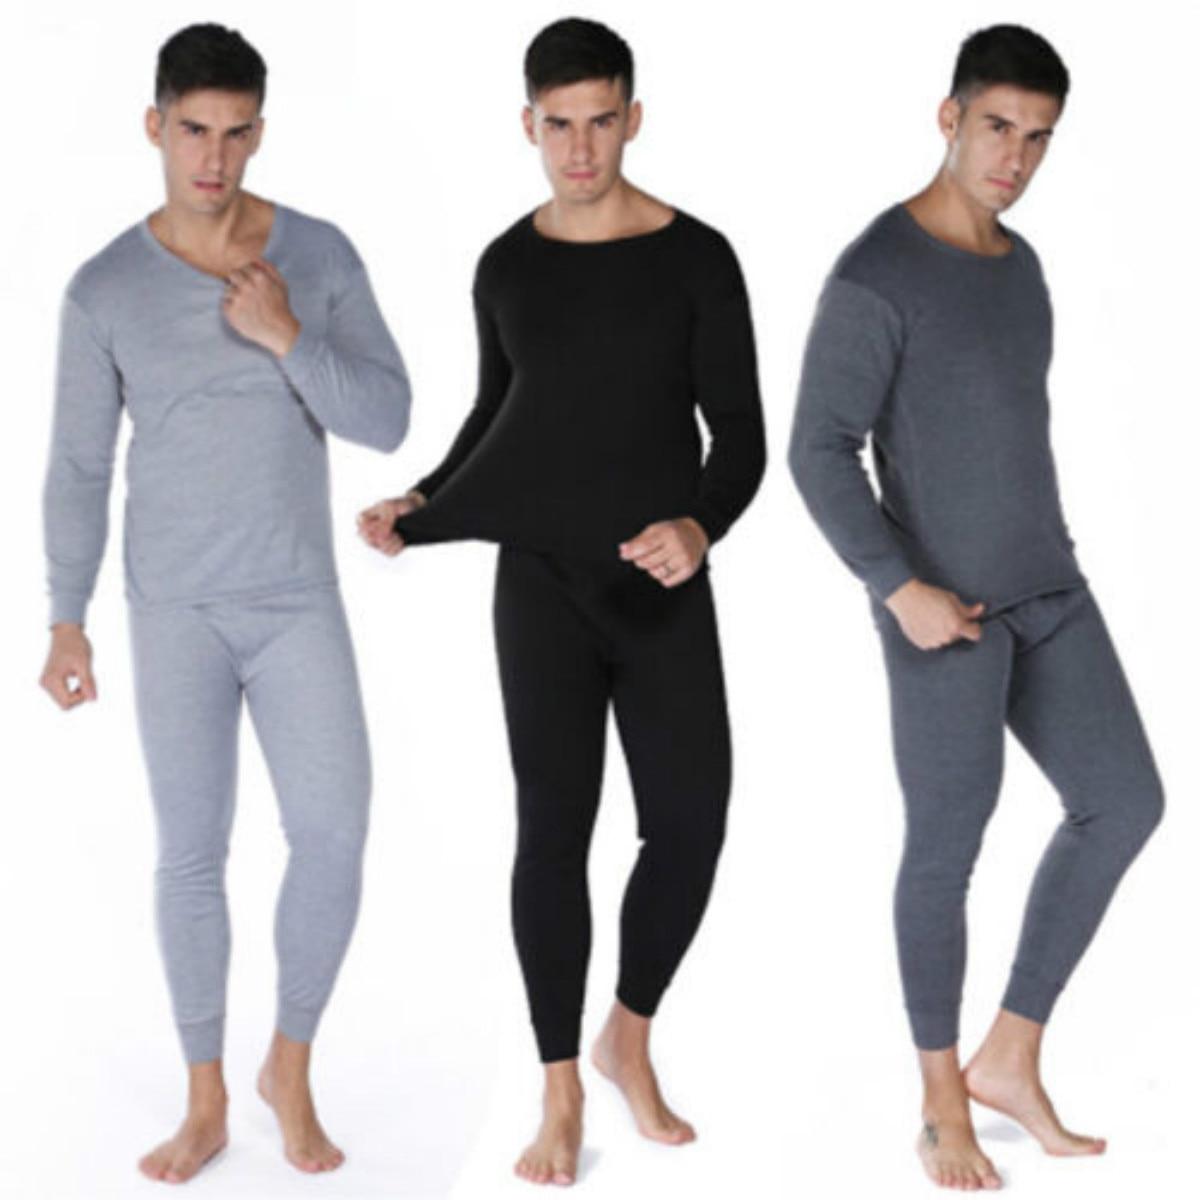 2018 New Brand Winter Fitness Men Thermal Underwear Set Long Sleeve Cotton  Top Bottom Nightwear 2PC New